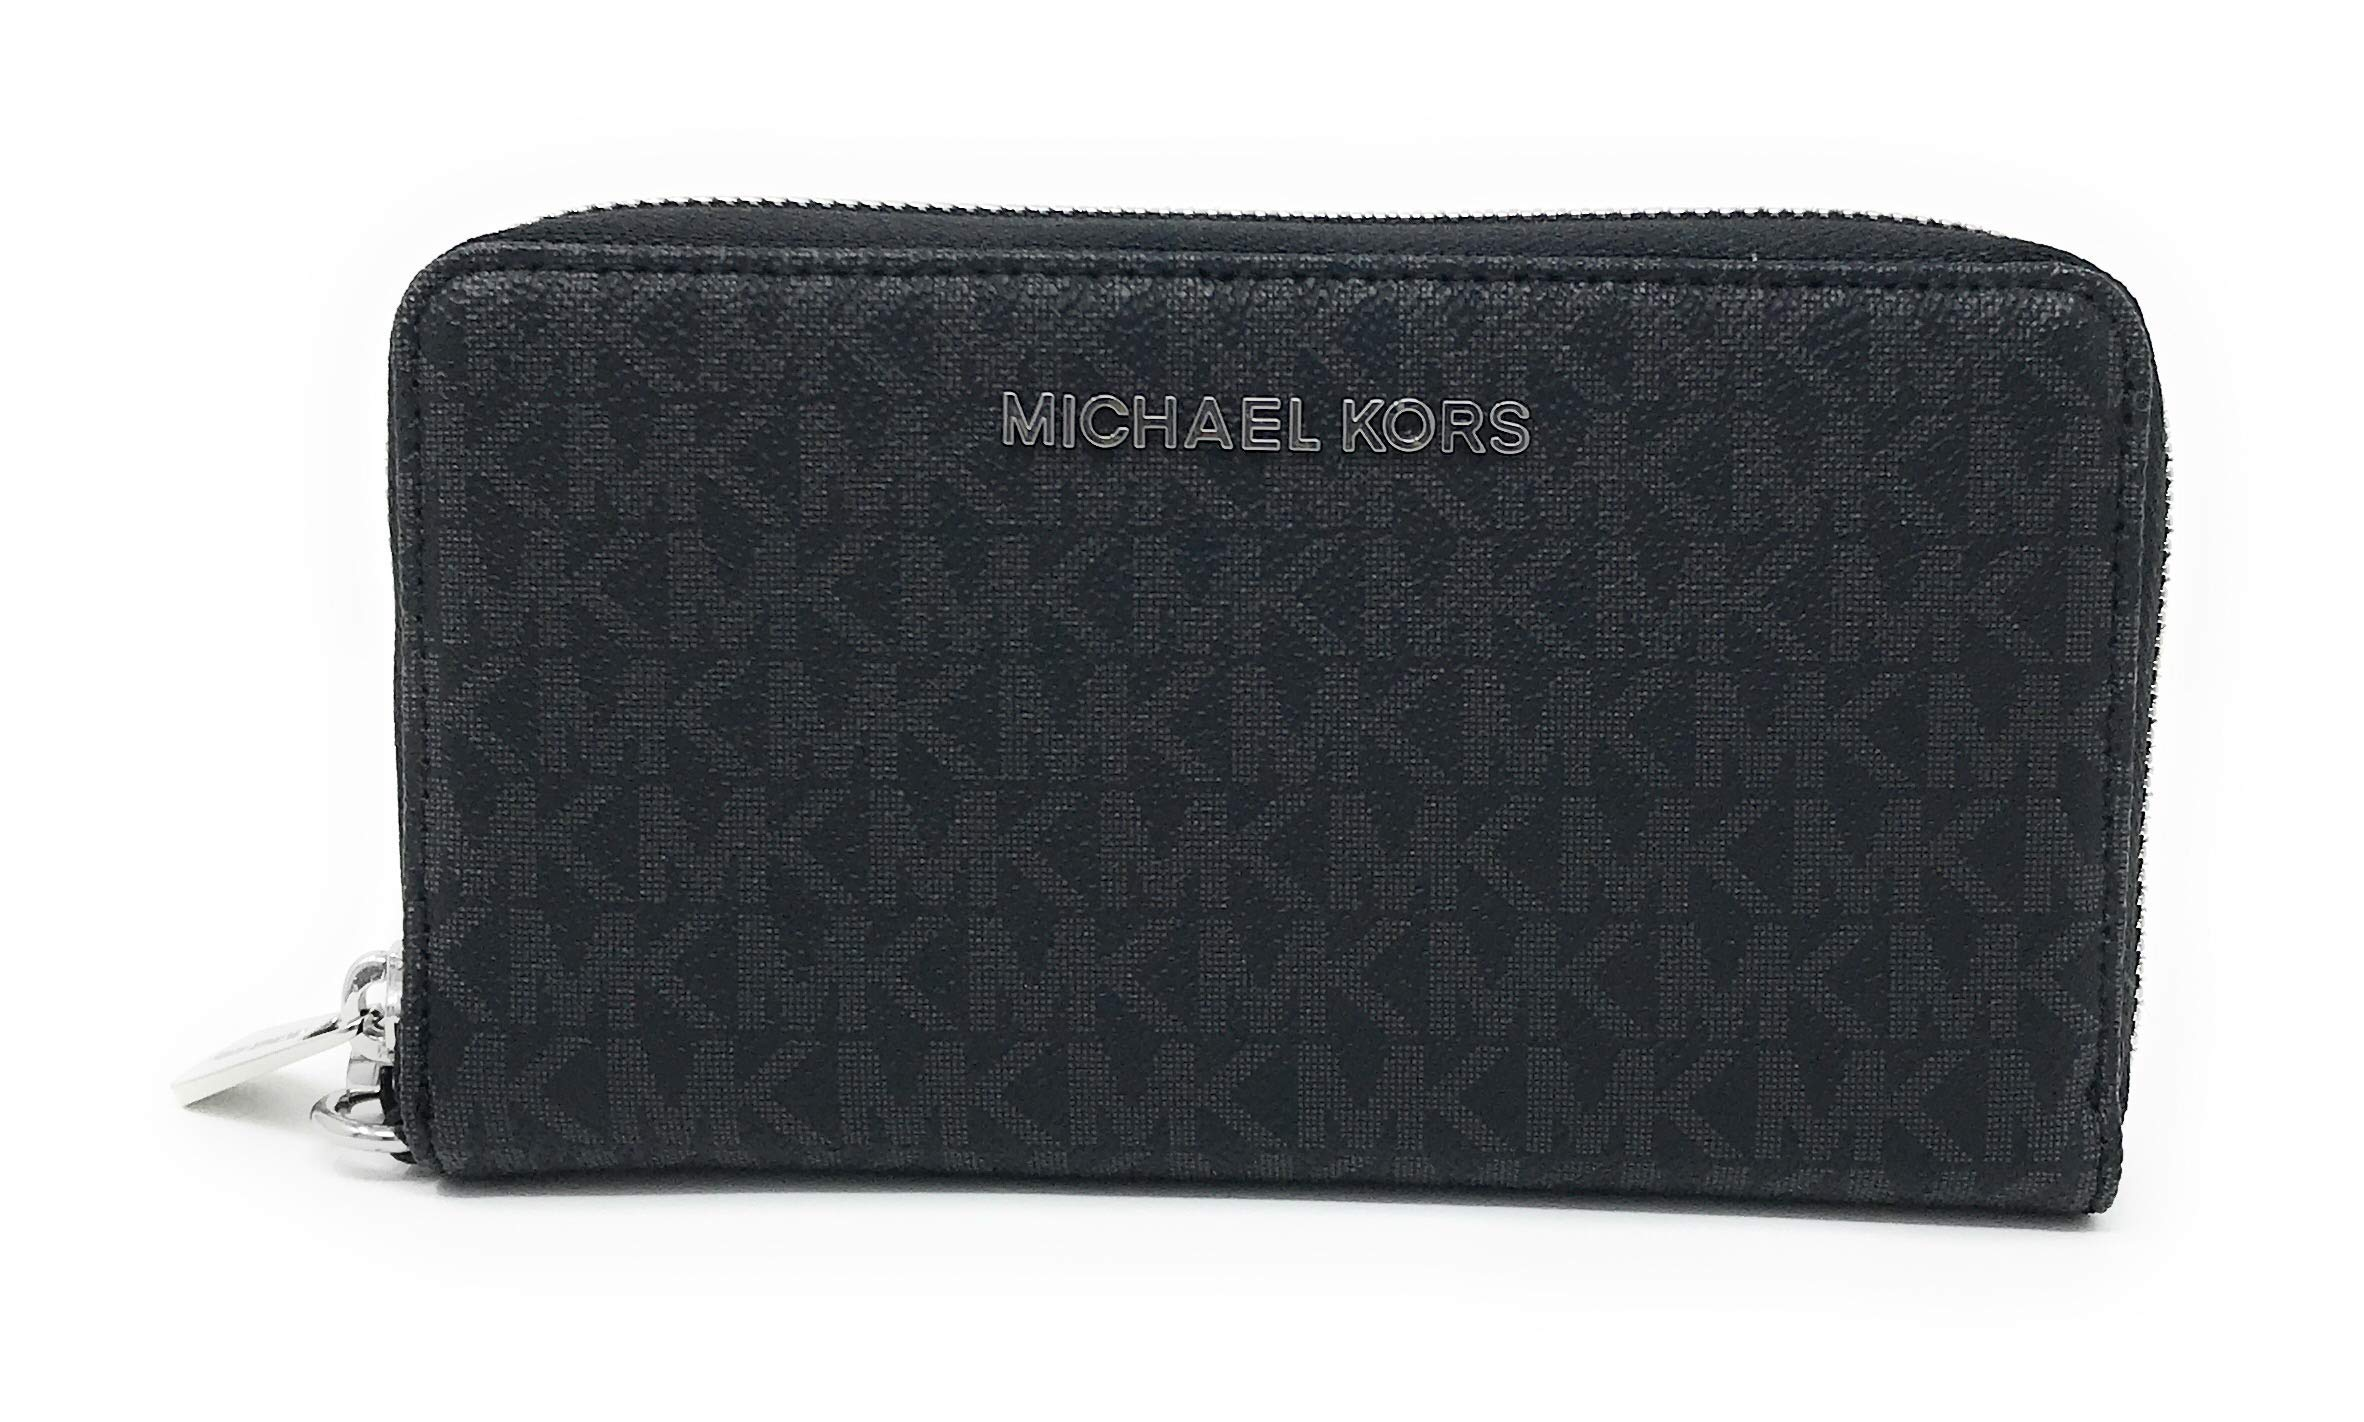 Michael Kors Women's Jet Set Travel Multifunction Phone Case